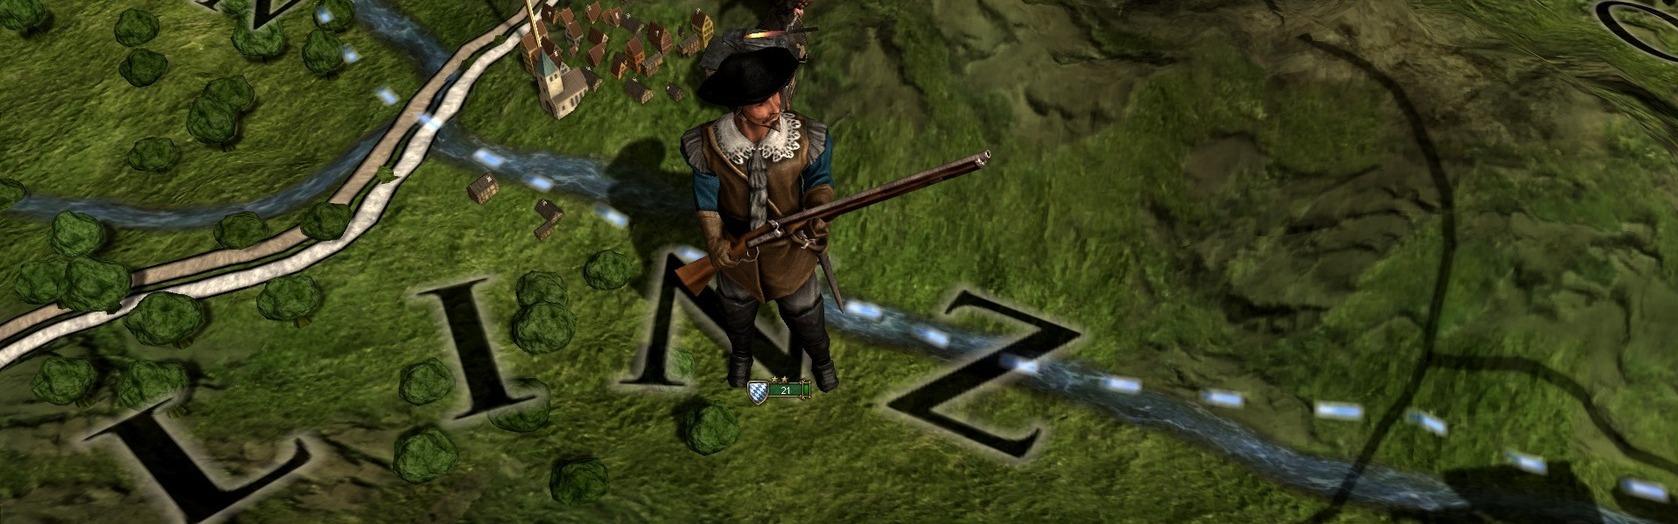 Europa Universalis IV - Conquistadors Unit Pack (DLC) Steam Key GLOBAL